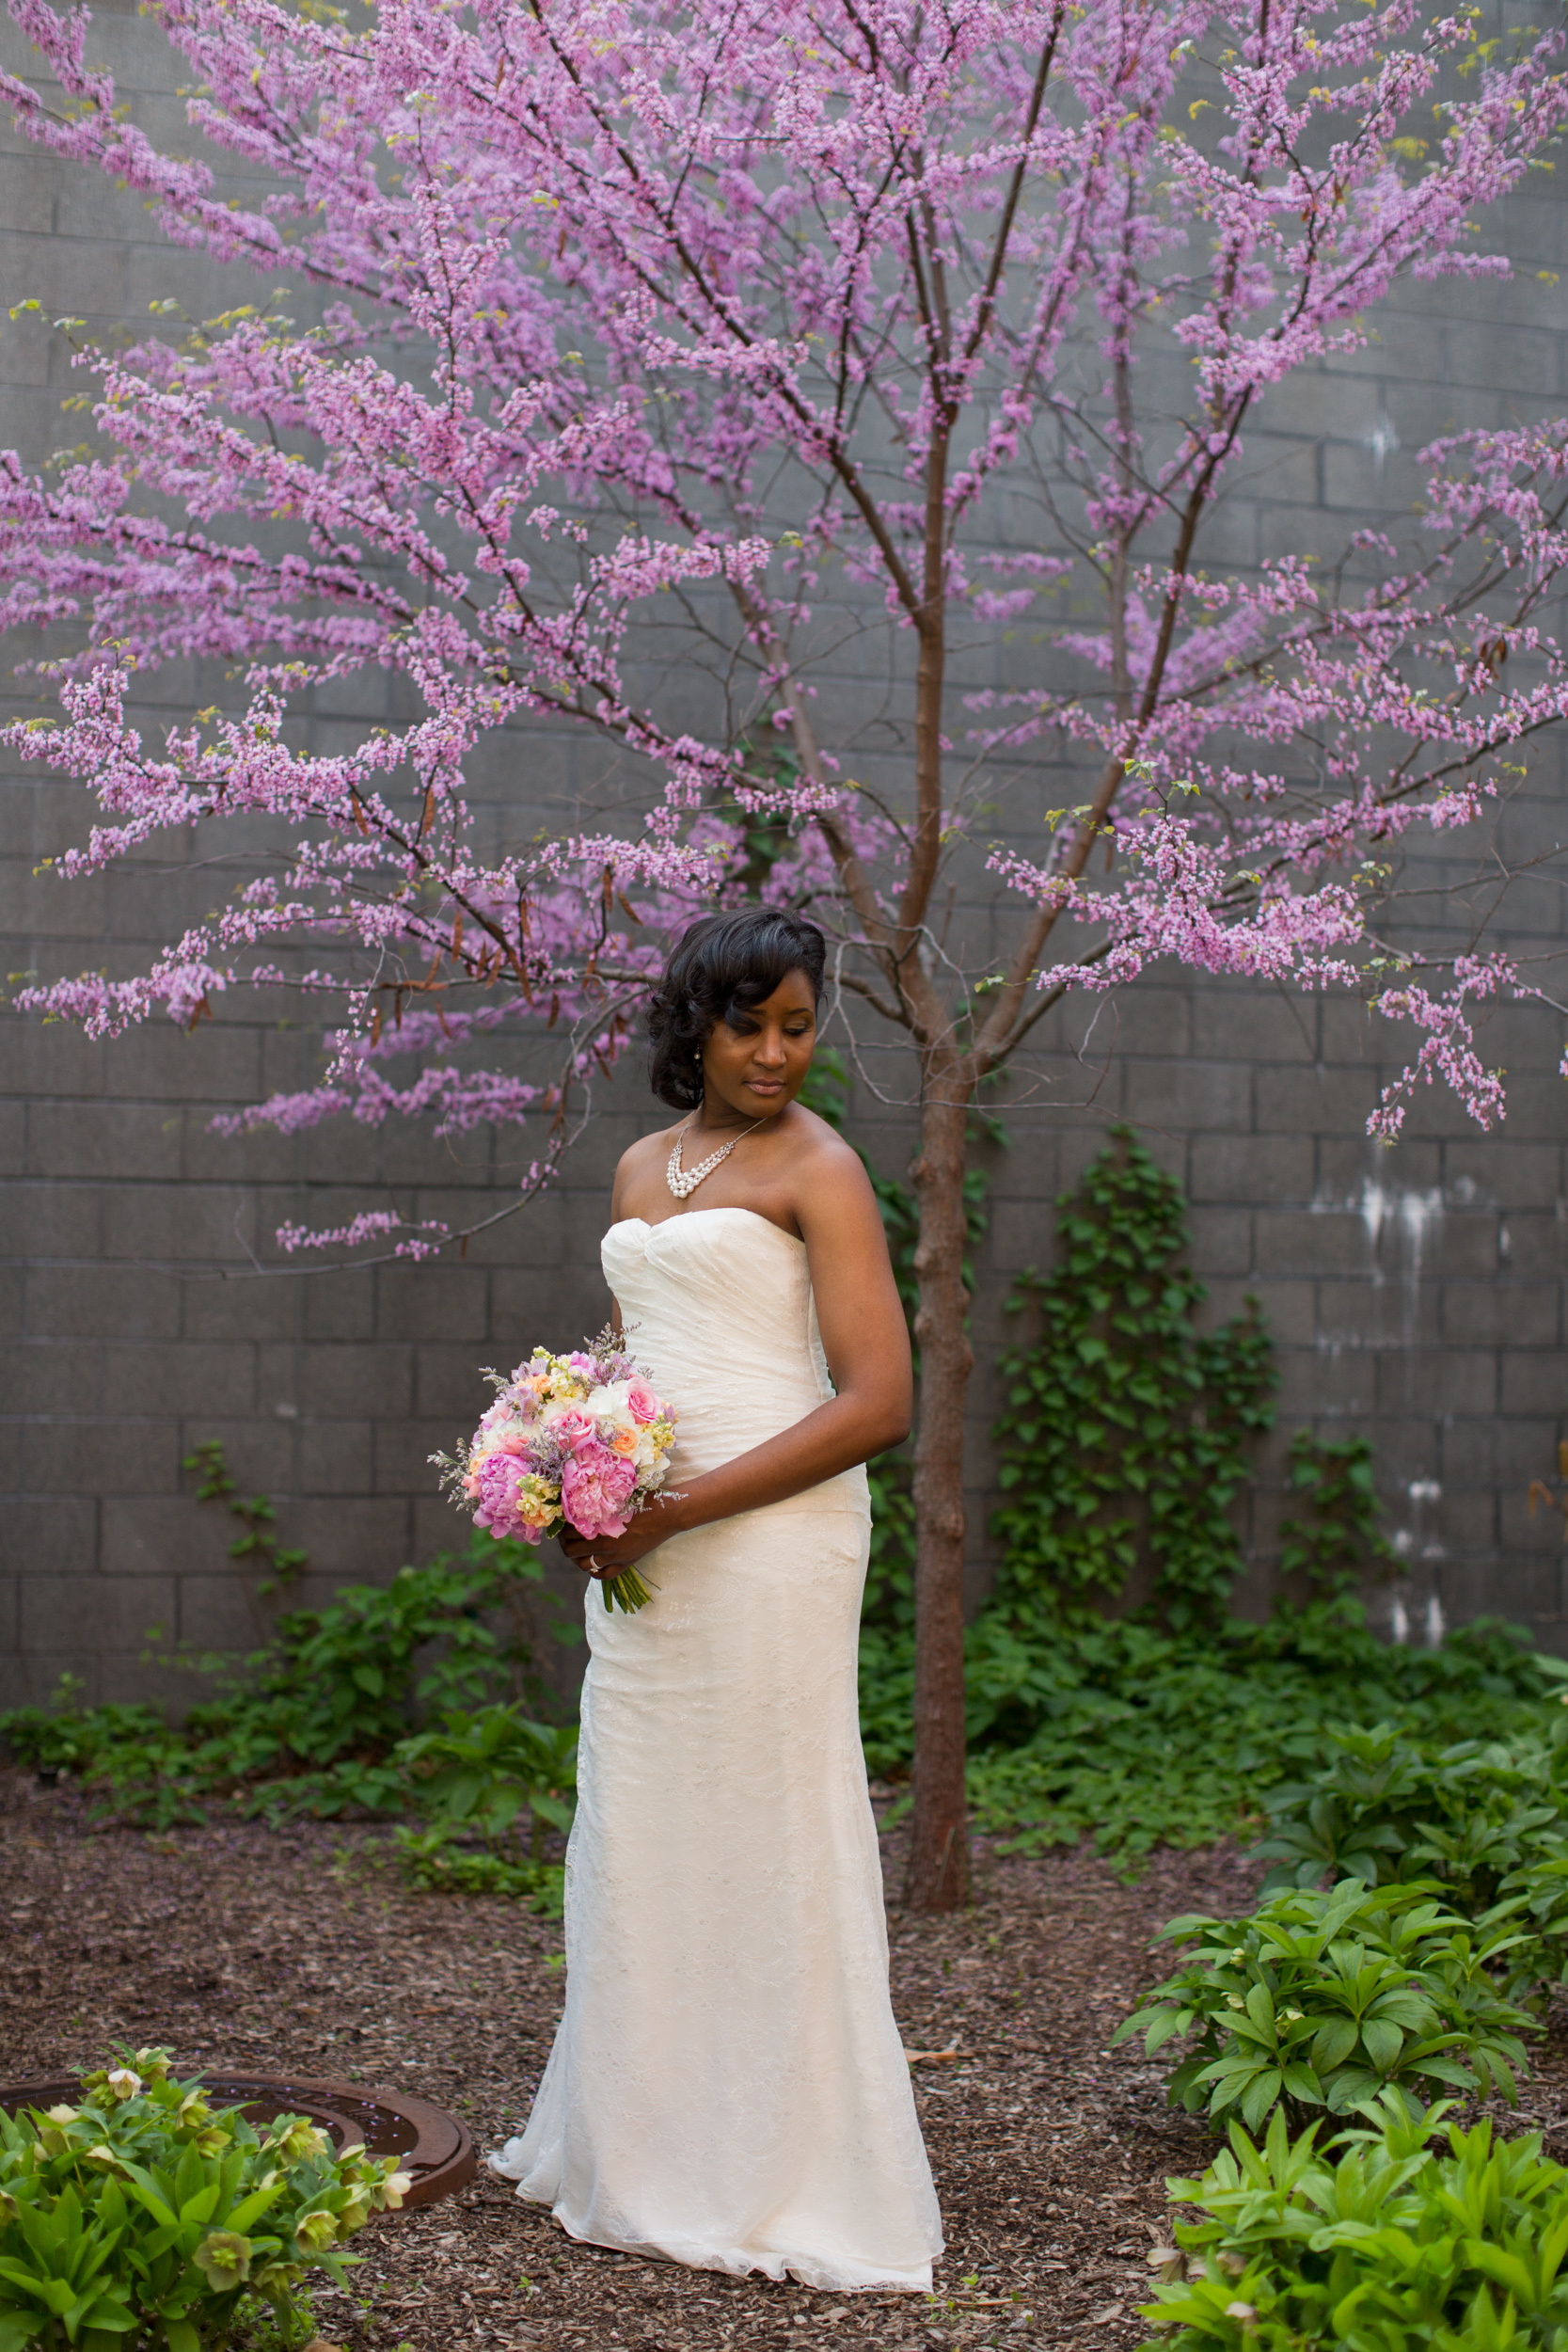 ann_arbor_weddings_010.JPG